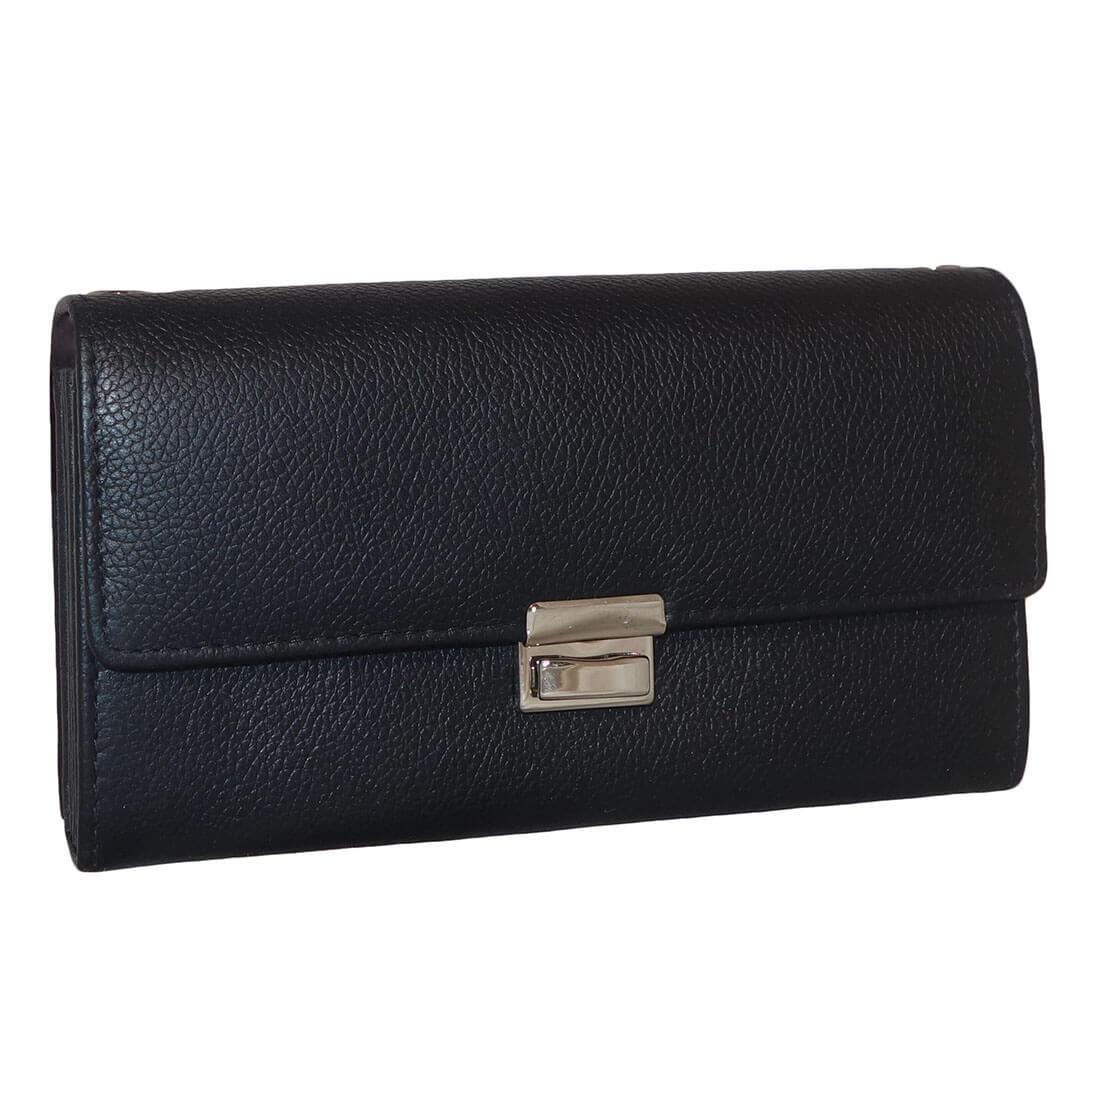 Horeca Portemonnee.Leather Design Koopmans Horeca Portemonnee Met Muntenbak Online Kopen